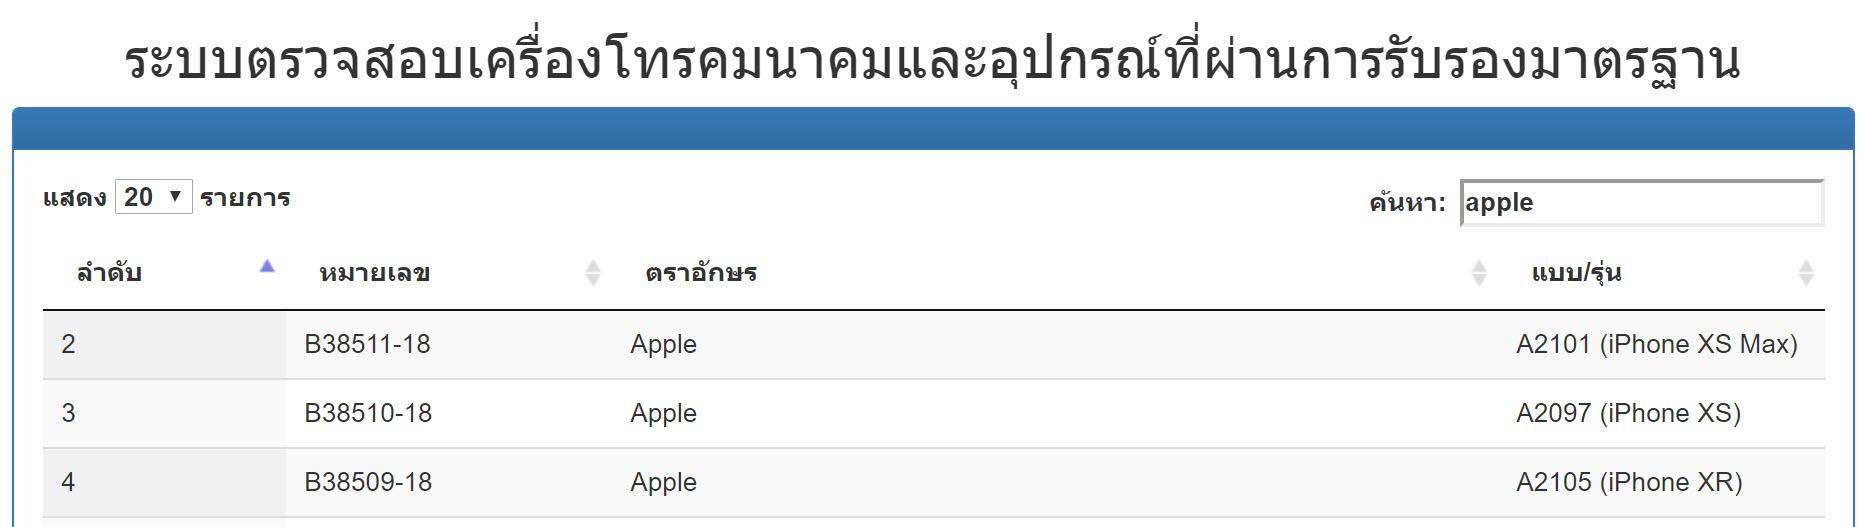 Nbtc Approve Iphone Xs Iphone Xs Max Iphone Xr Img 1